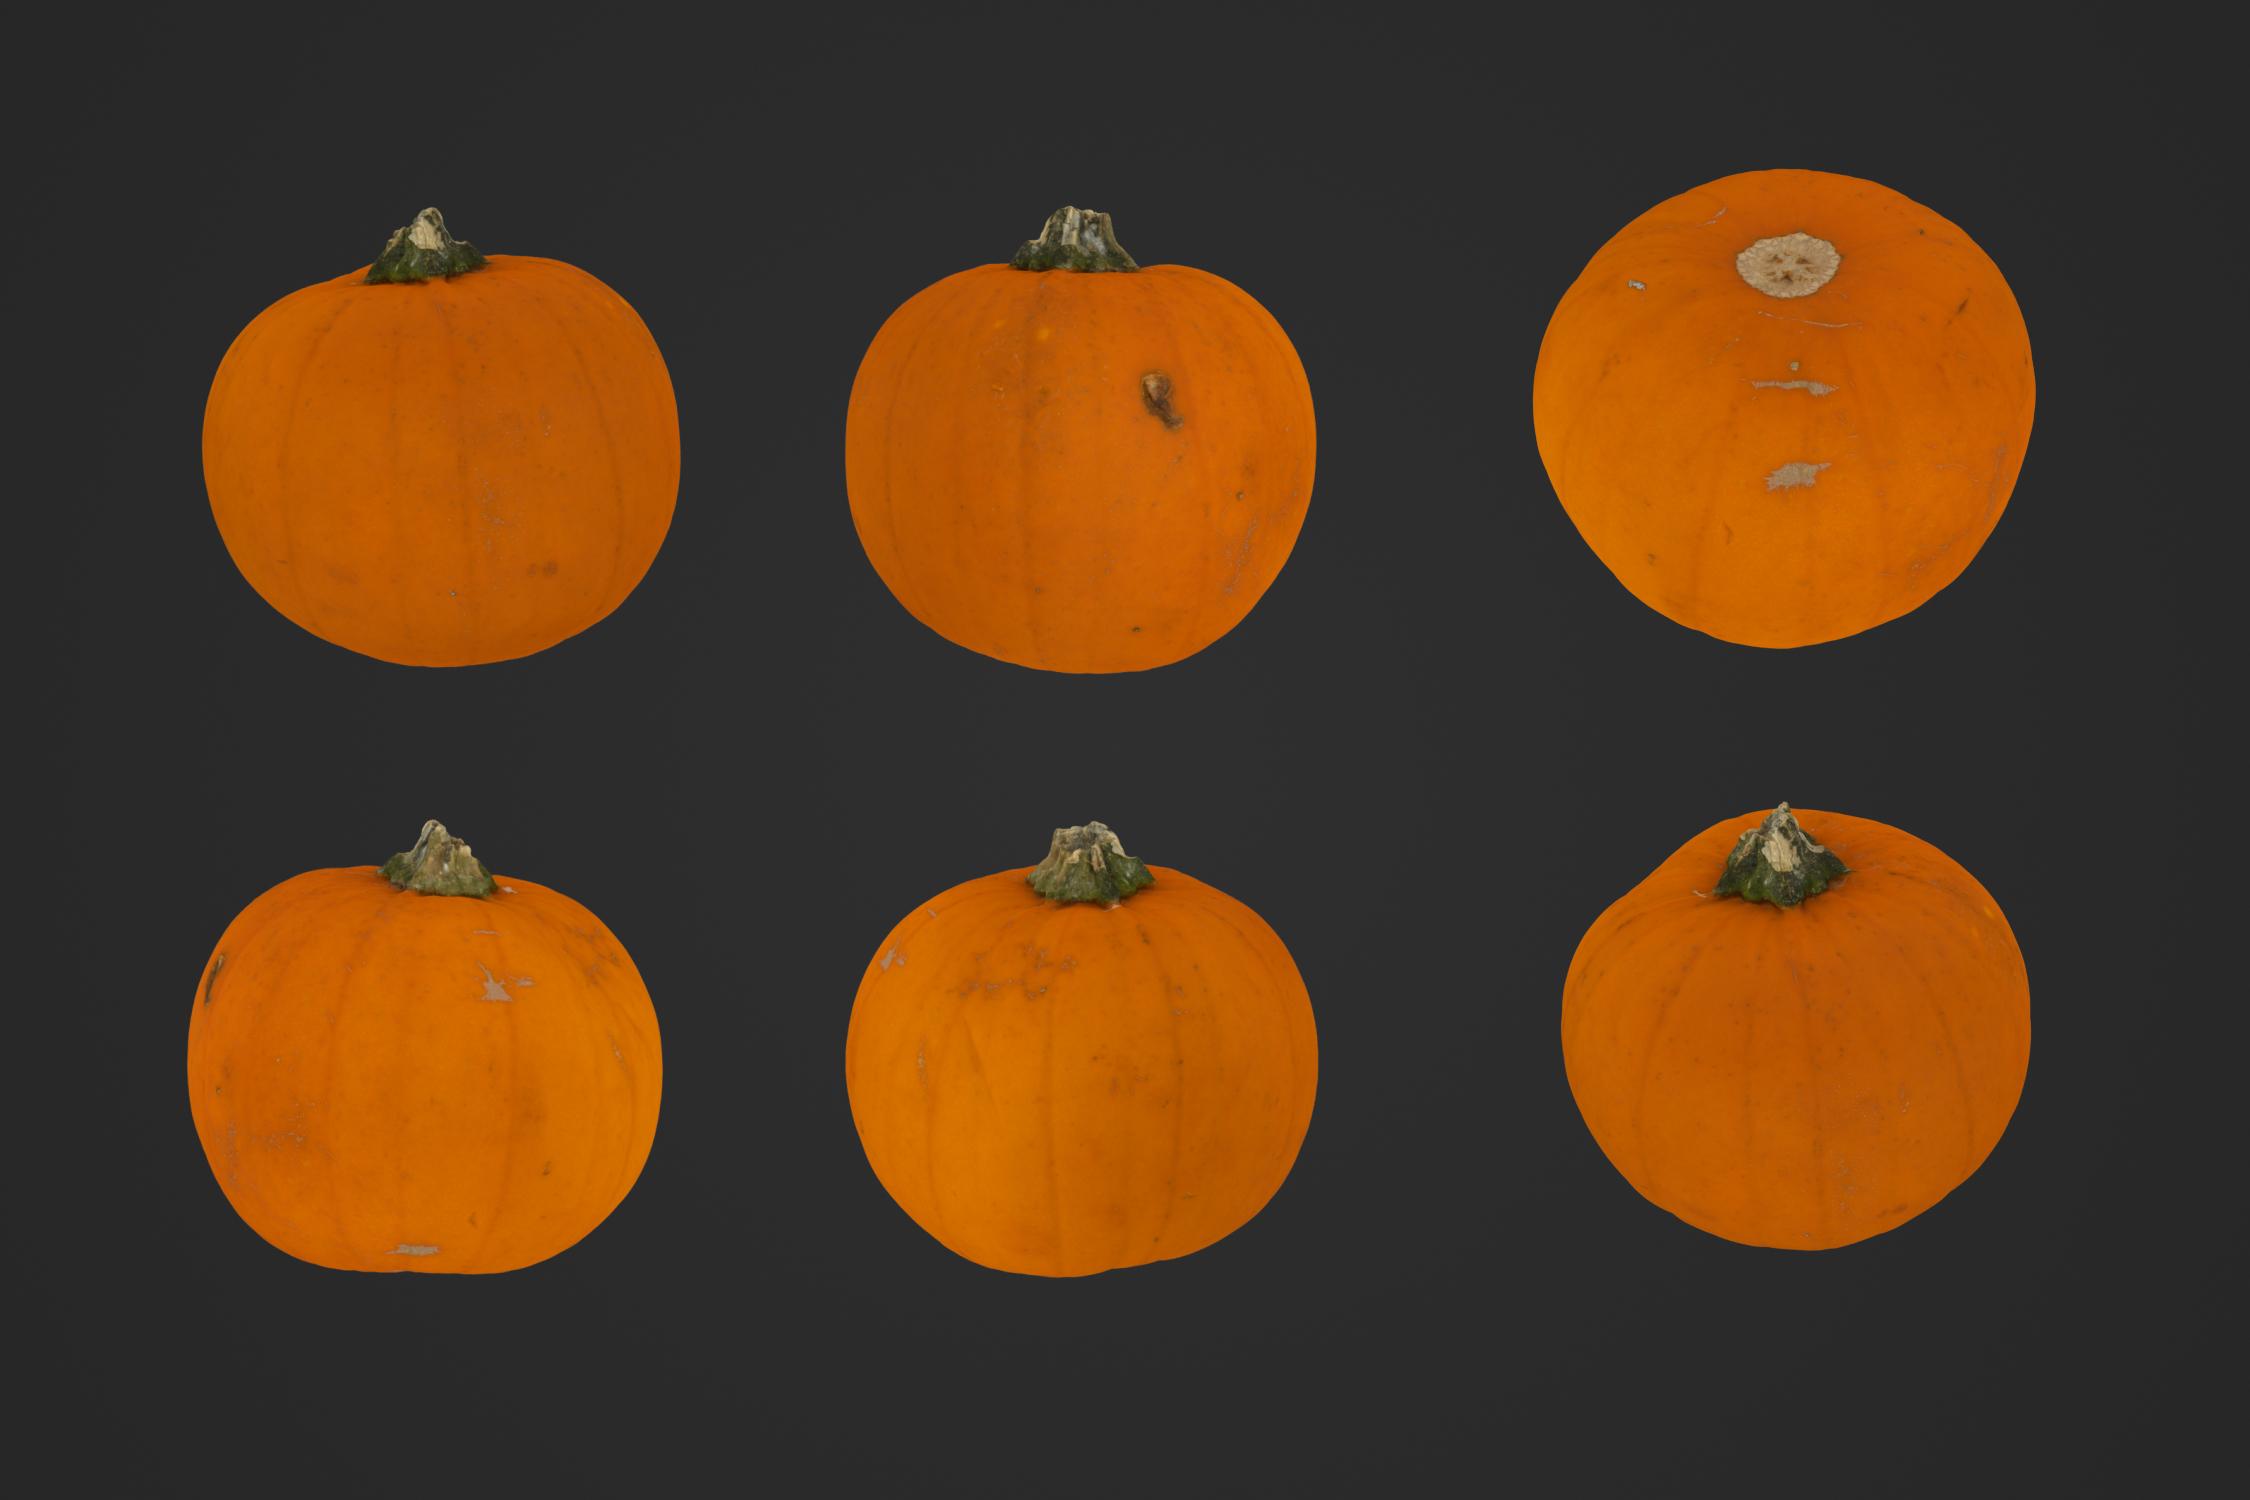 Small_Pumpkin_1_1.jpg